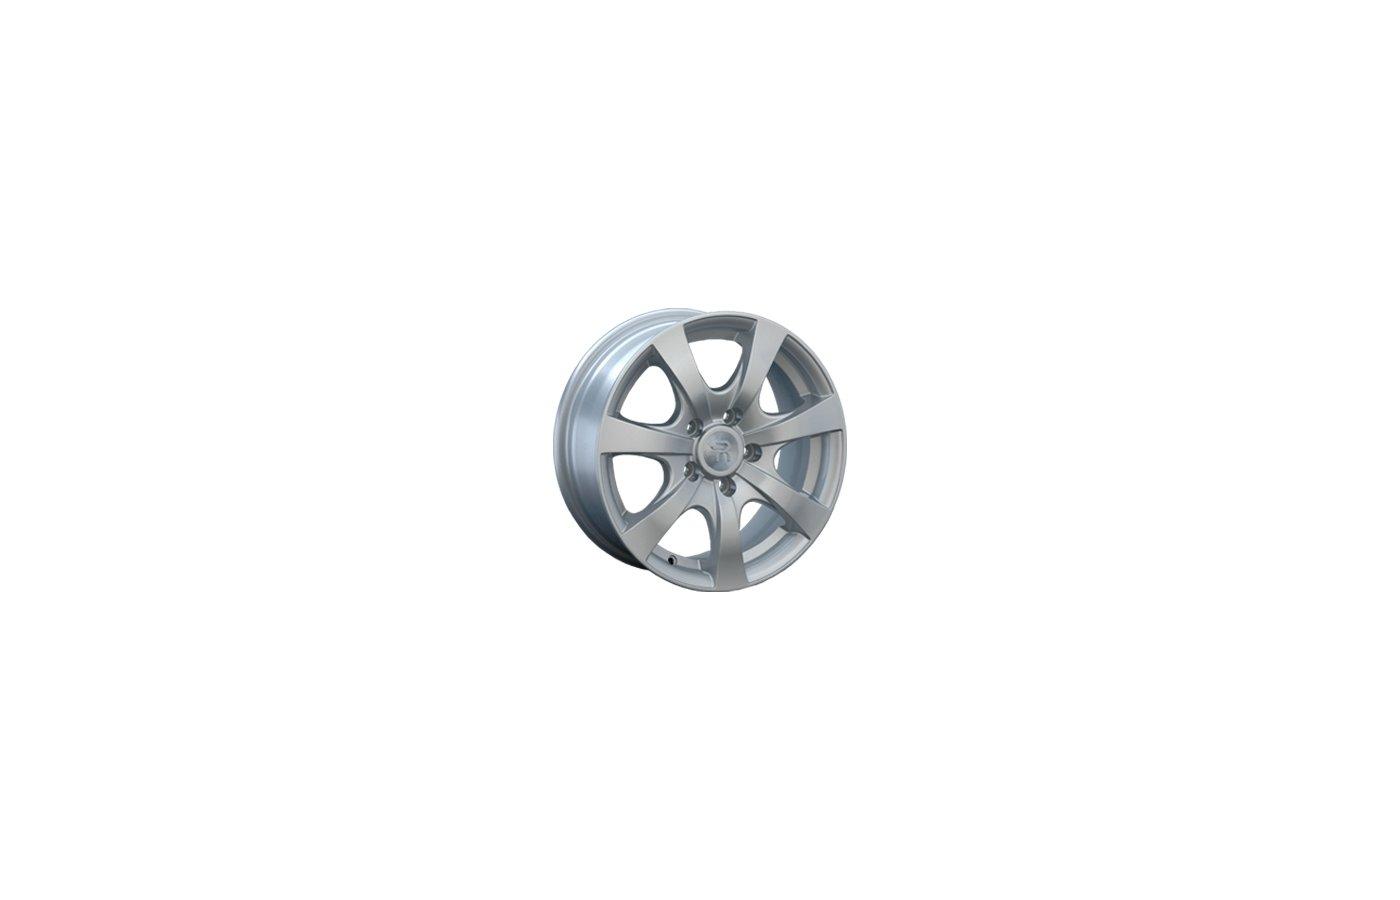 Диск Replay OPL20 6.5x15/5x105 D56.6 ET39 S